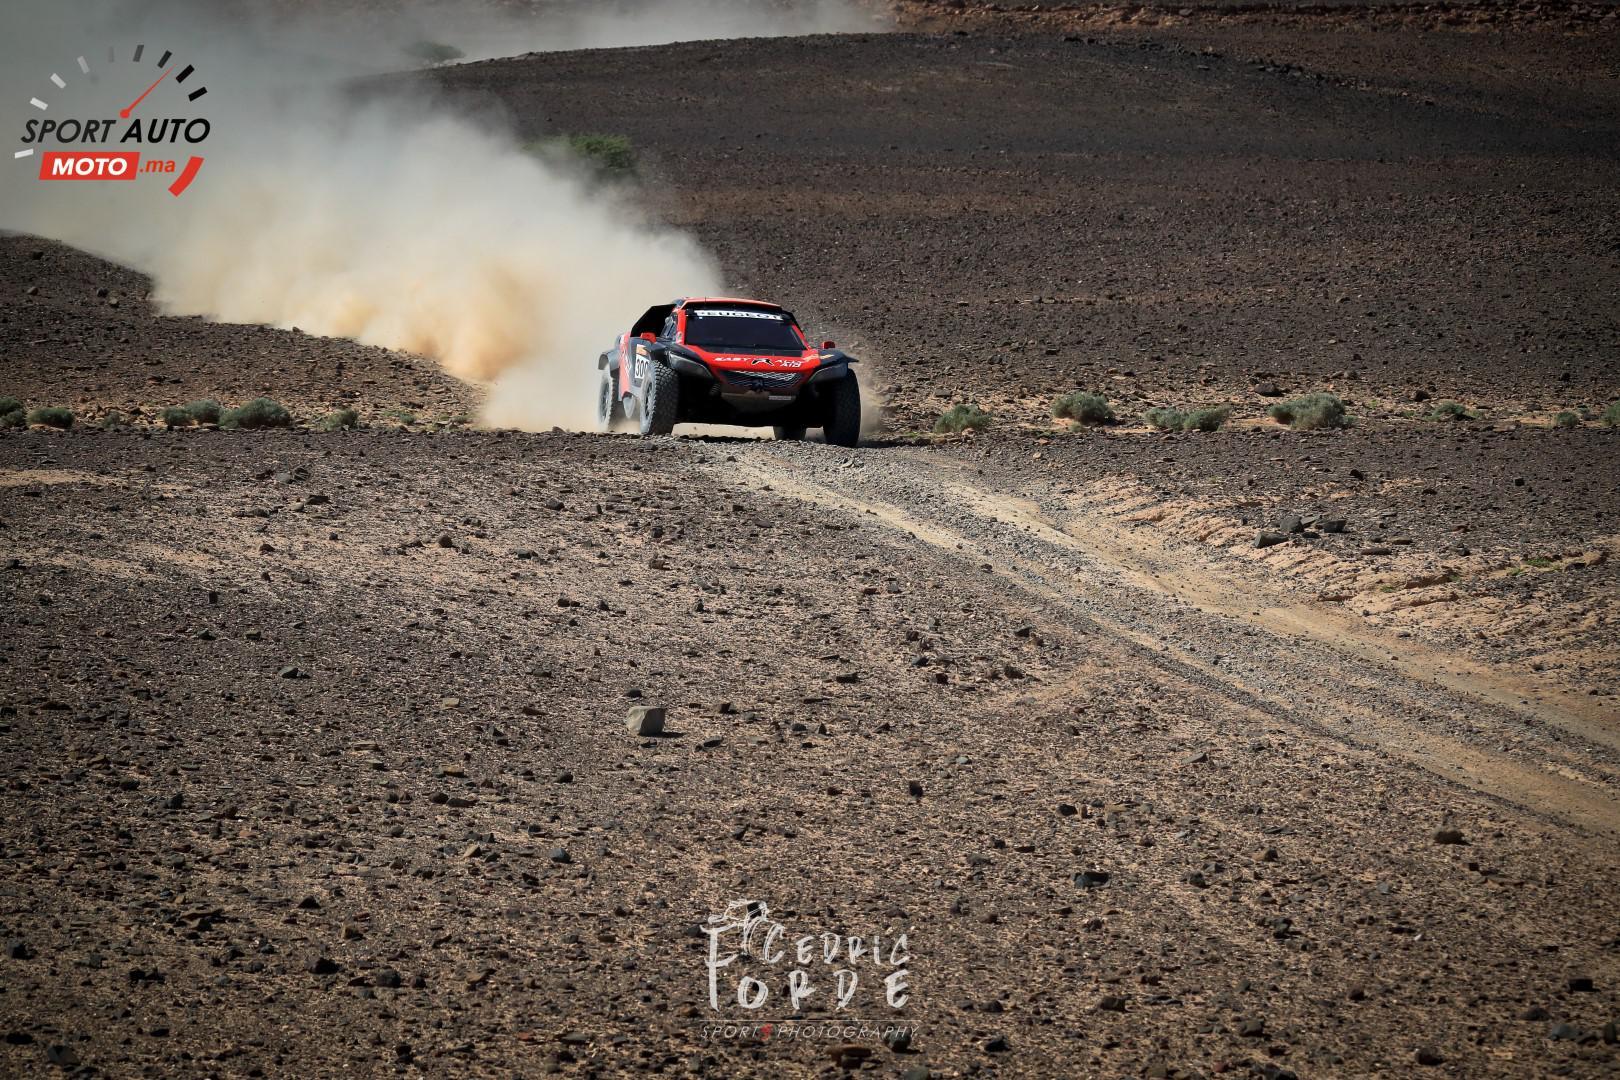 hearts-of-morocco-2018-zapletal-et-pedrero-remporte-le-rallye-899-4.jpg